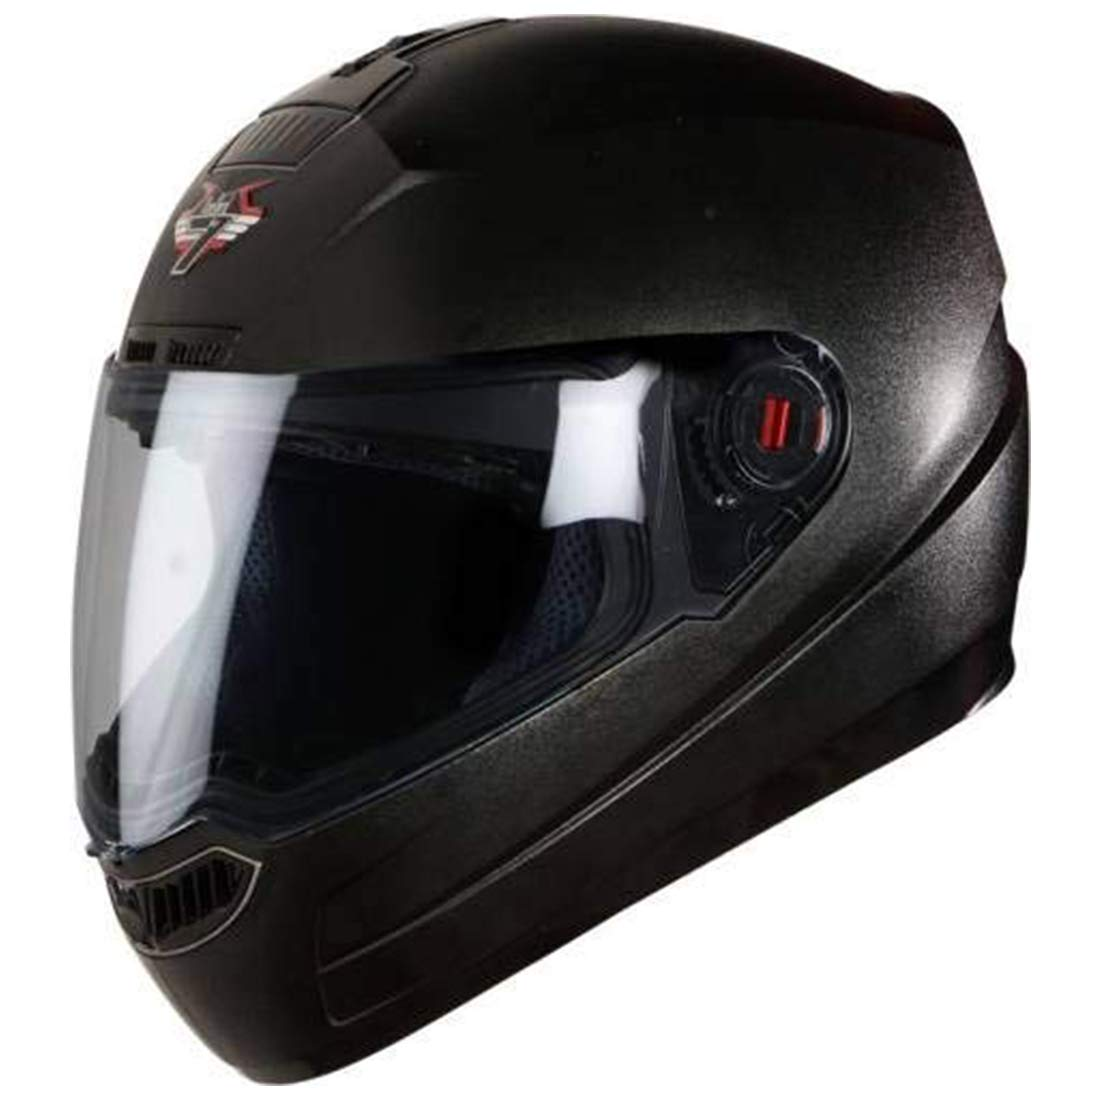 Black Color Steelbird SBA-1 Classic 7WINGS Full Face Helmet